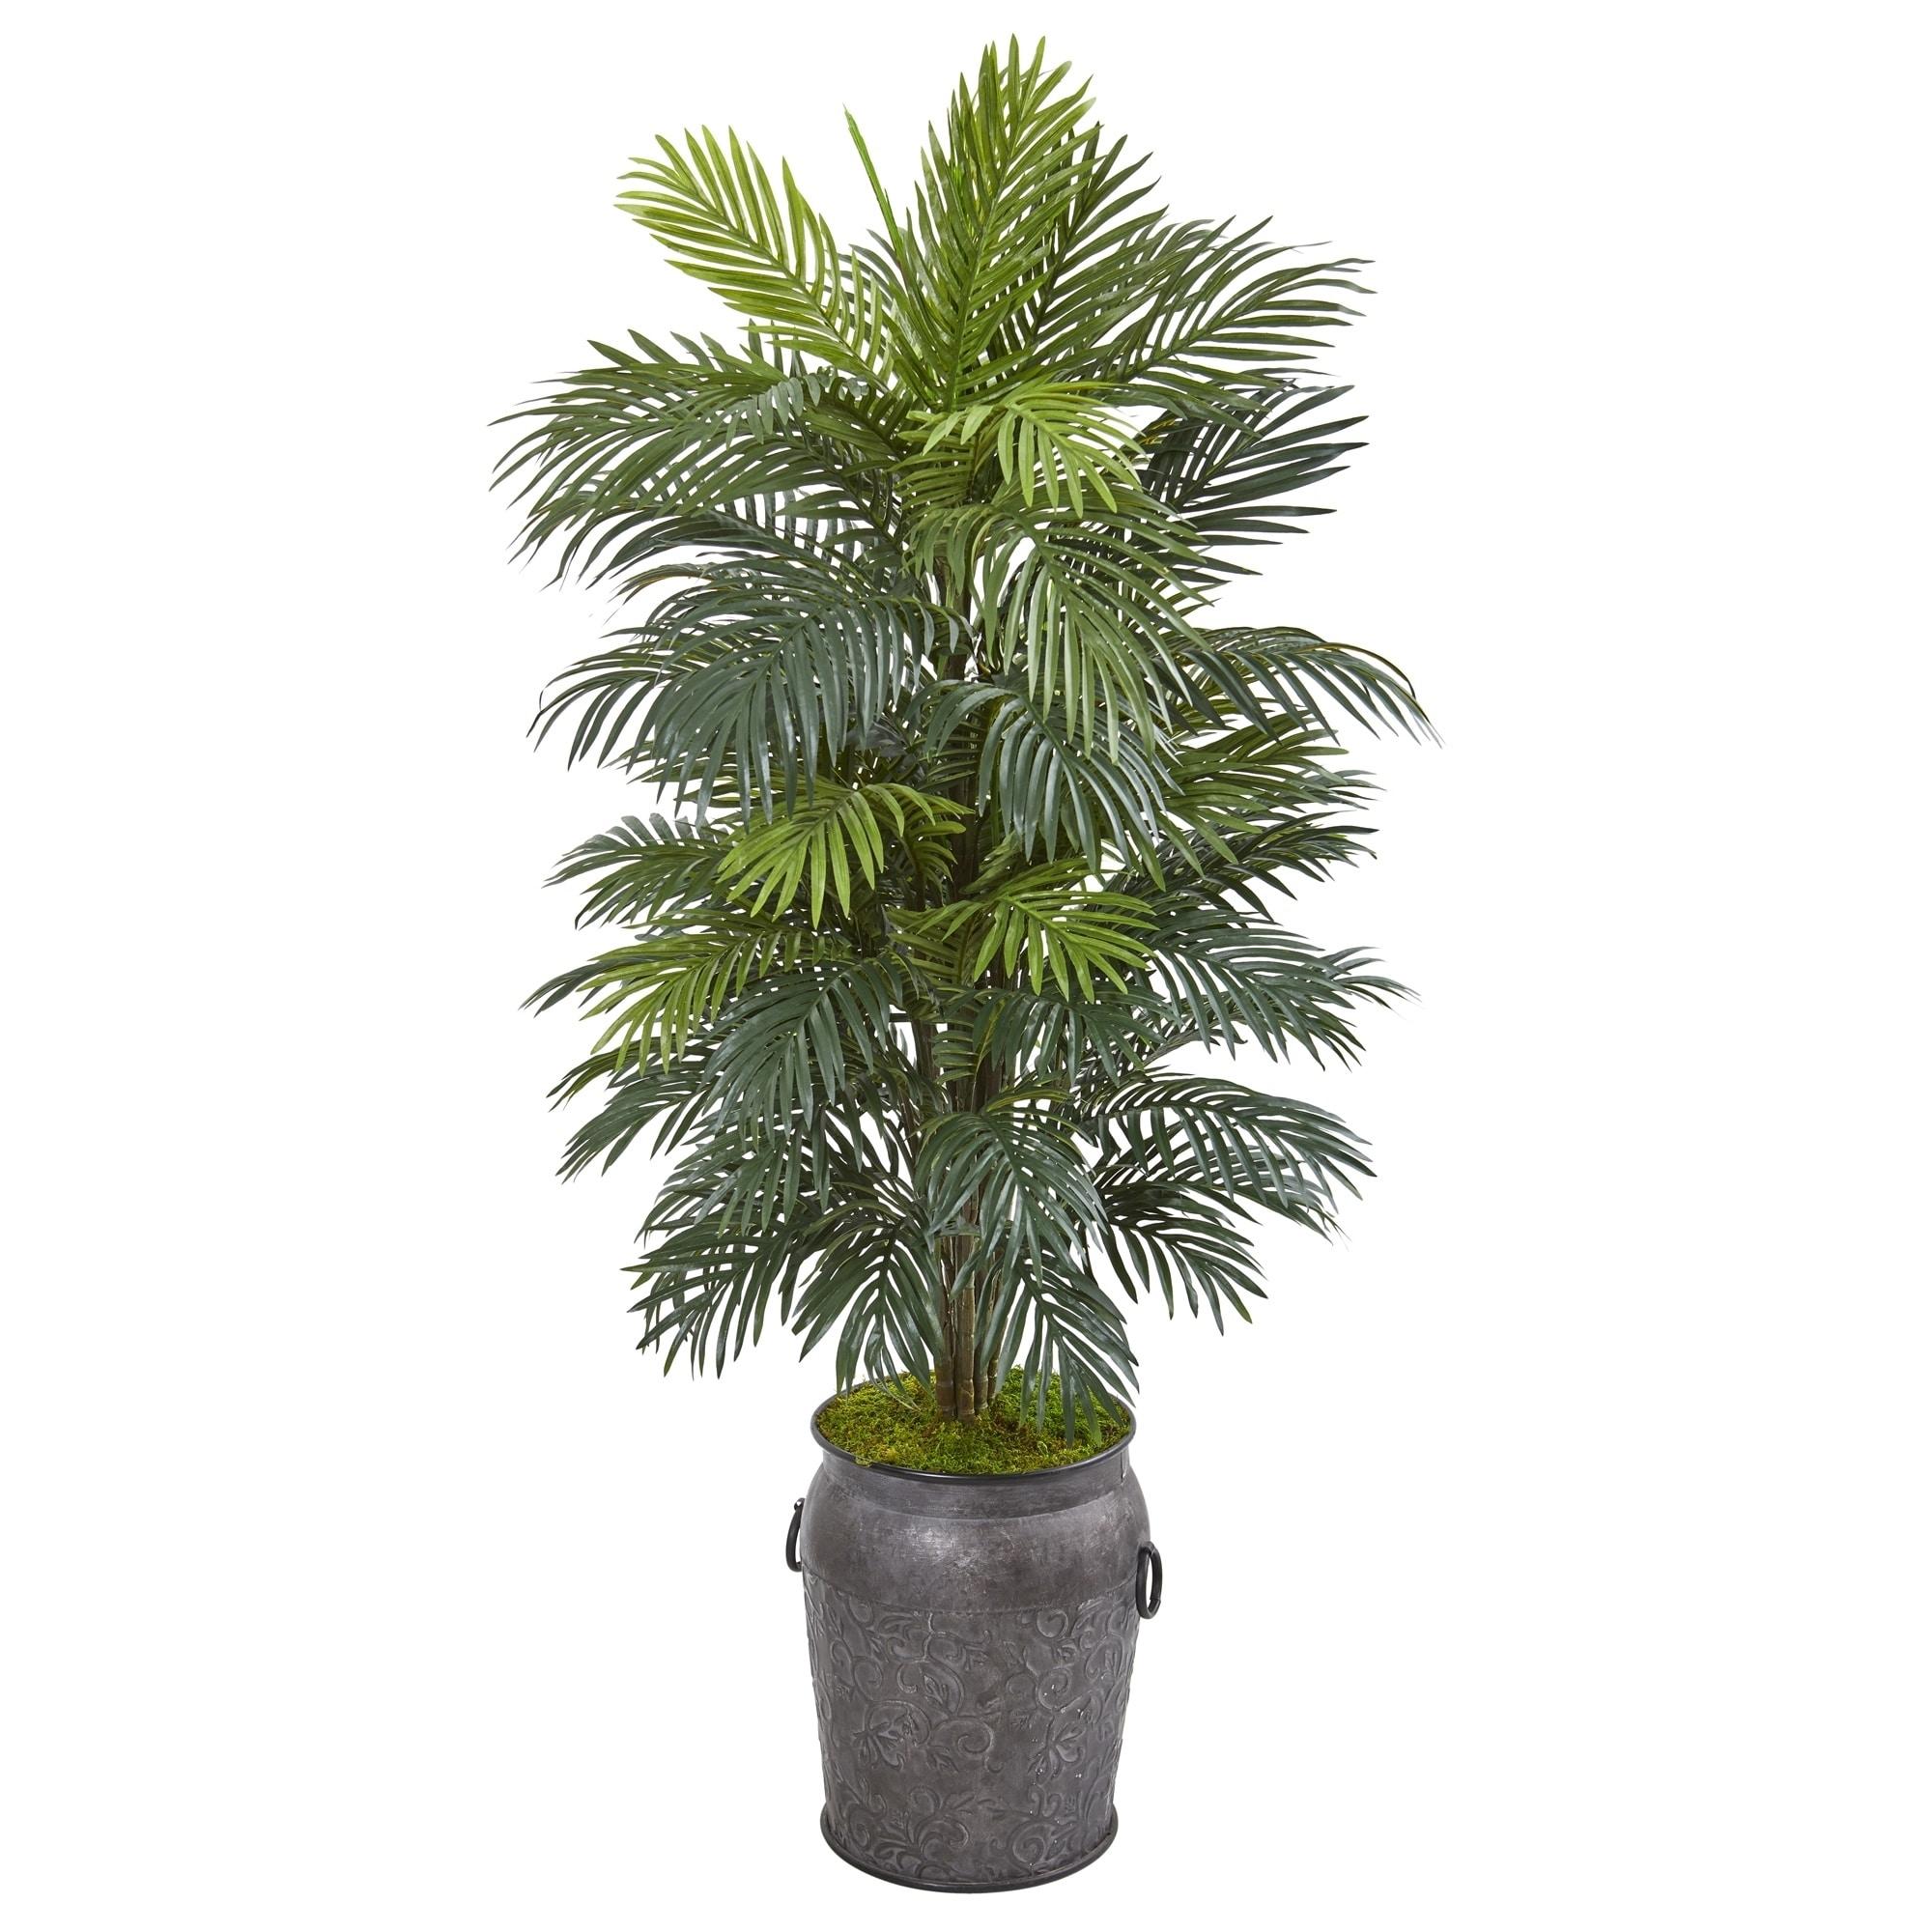 5 Areca Palm Artificial Plant in Metal Planter